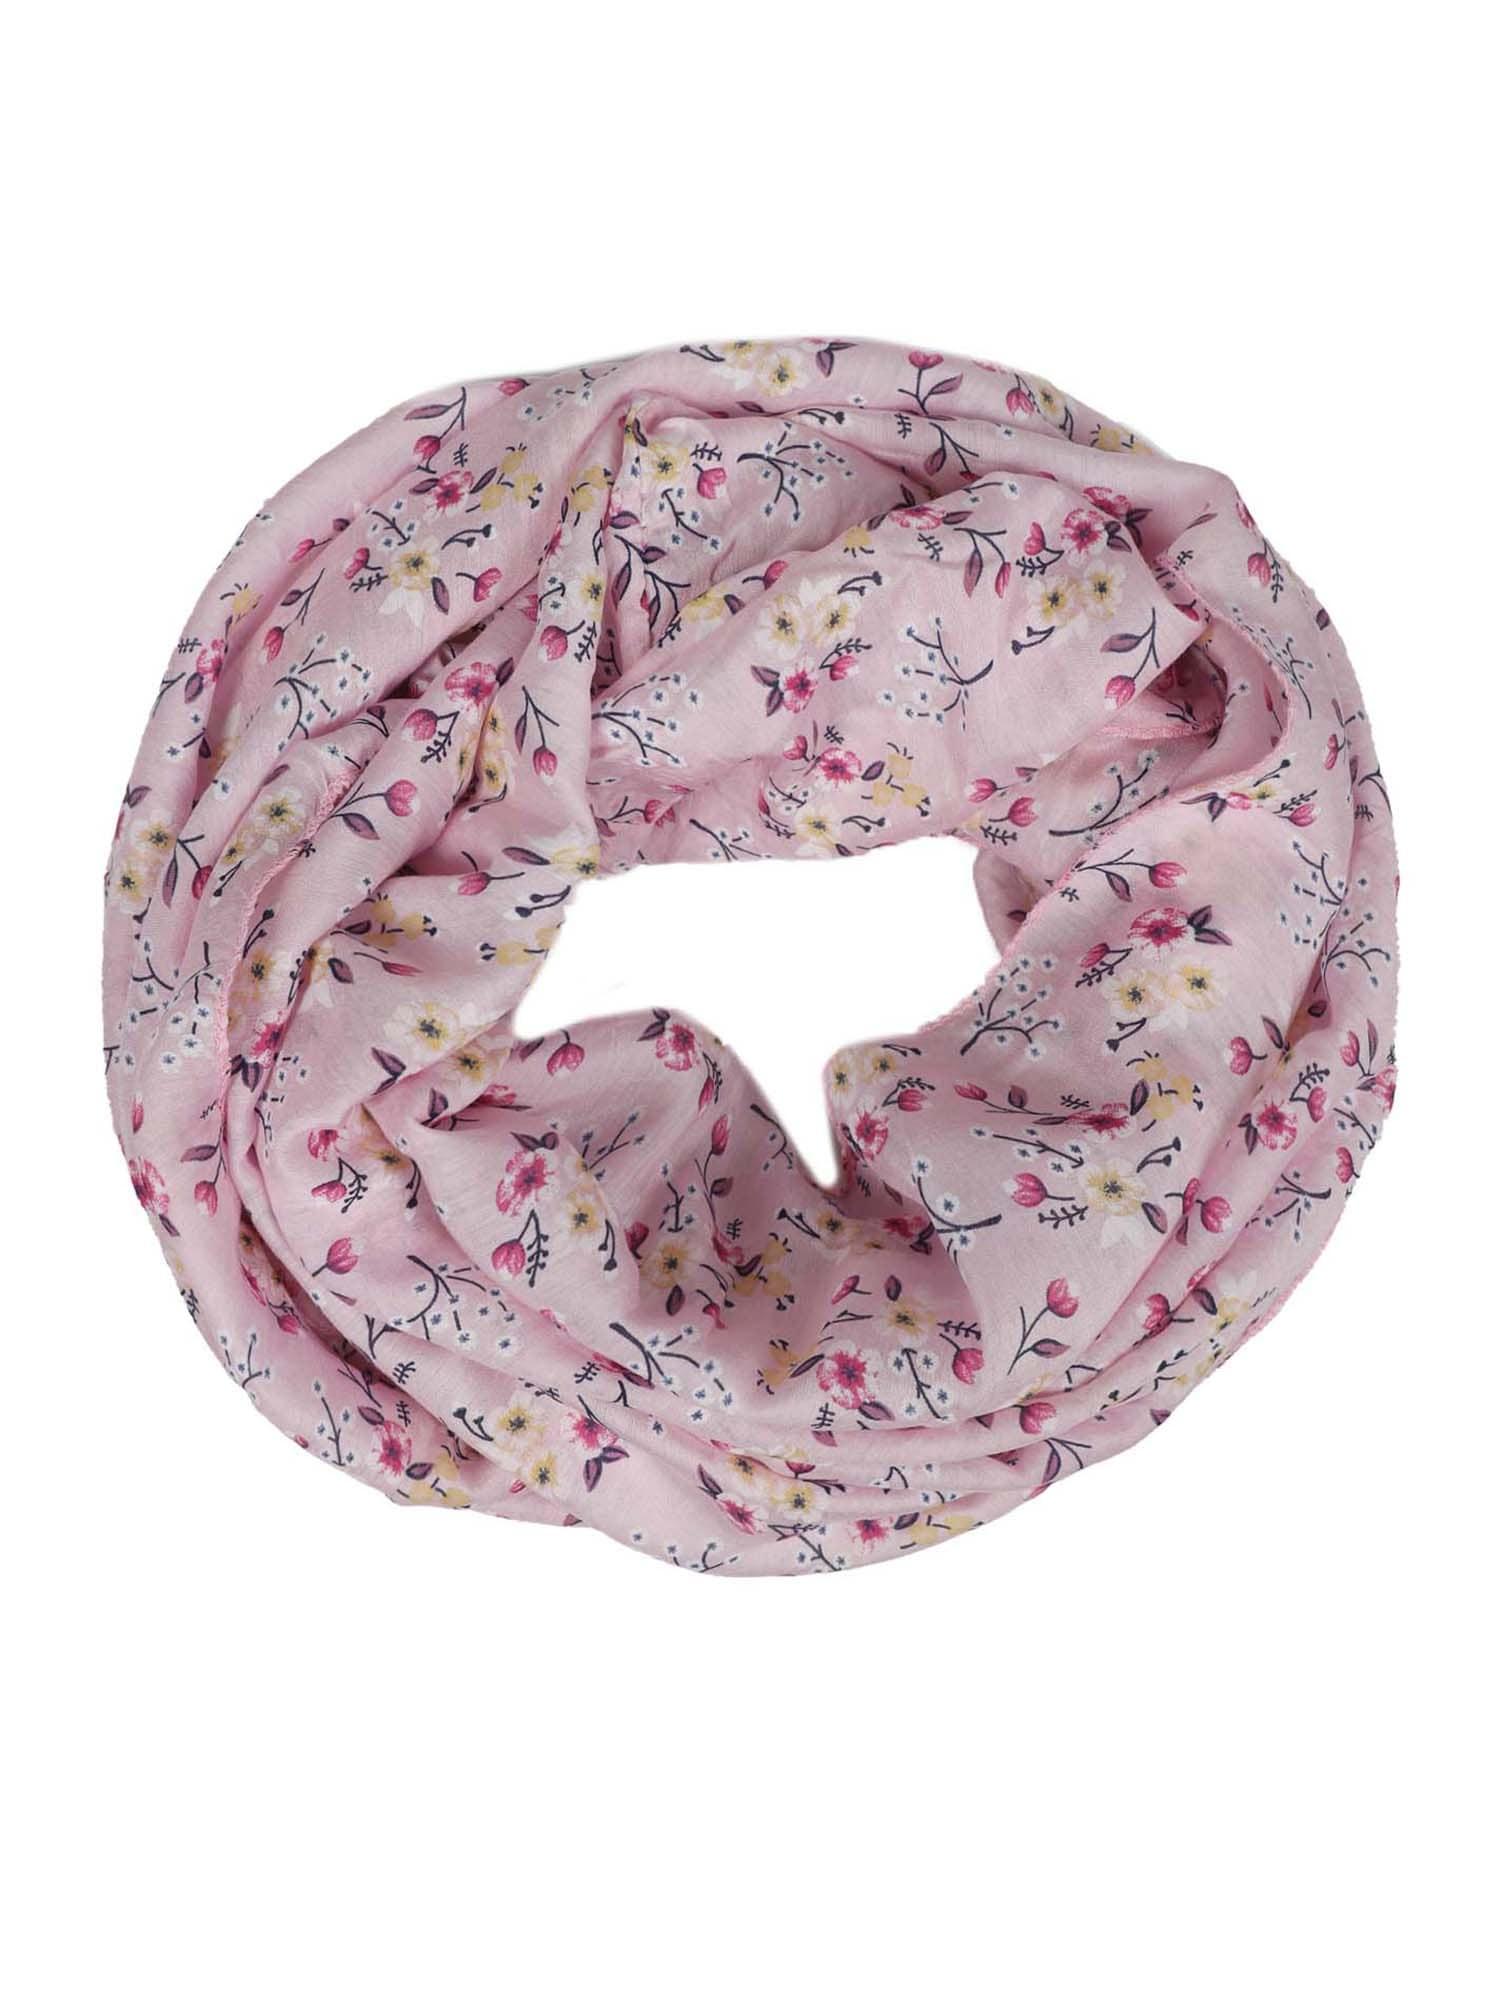 Zwillingsherz Mova 'Fleur' mišrios spalvos / rožių spalva